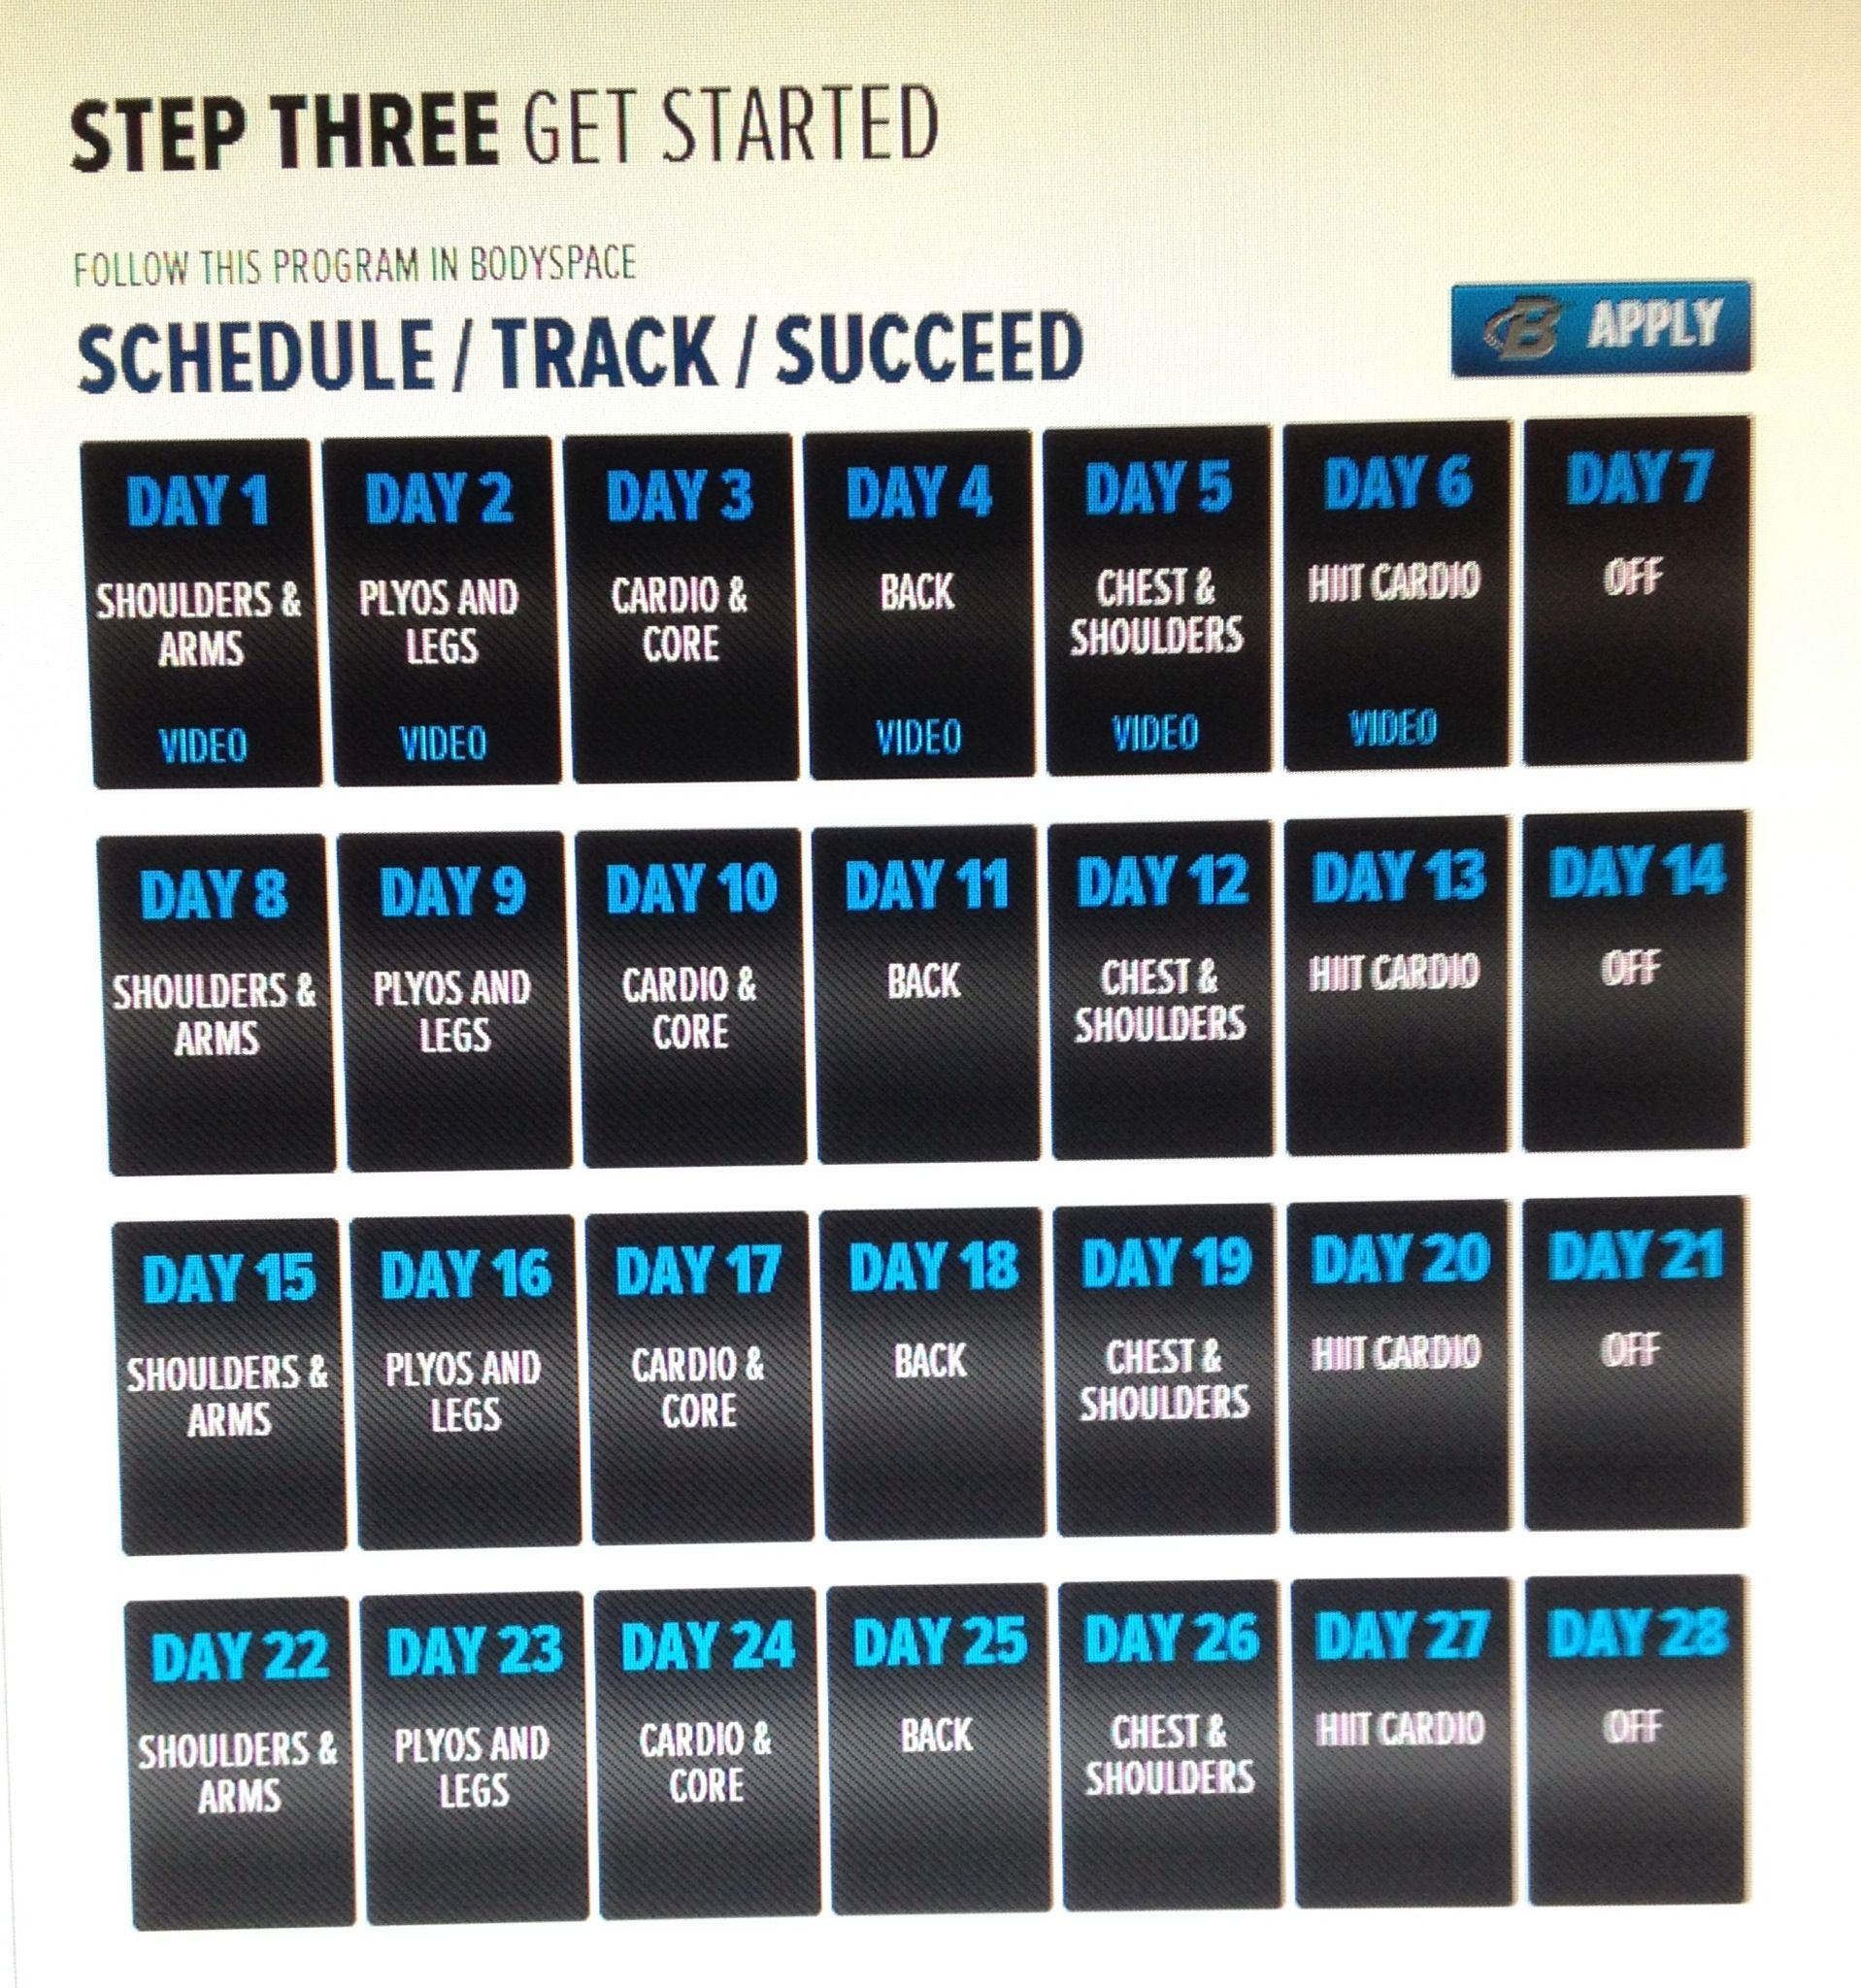 Erin Stern's Elite Body 4 Week Calendar: I Am Looking